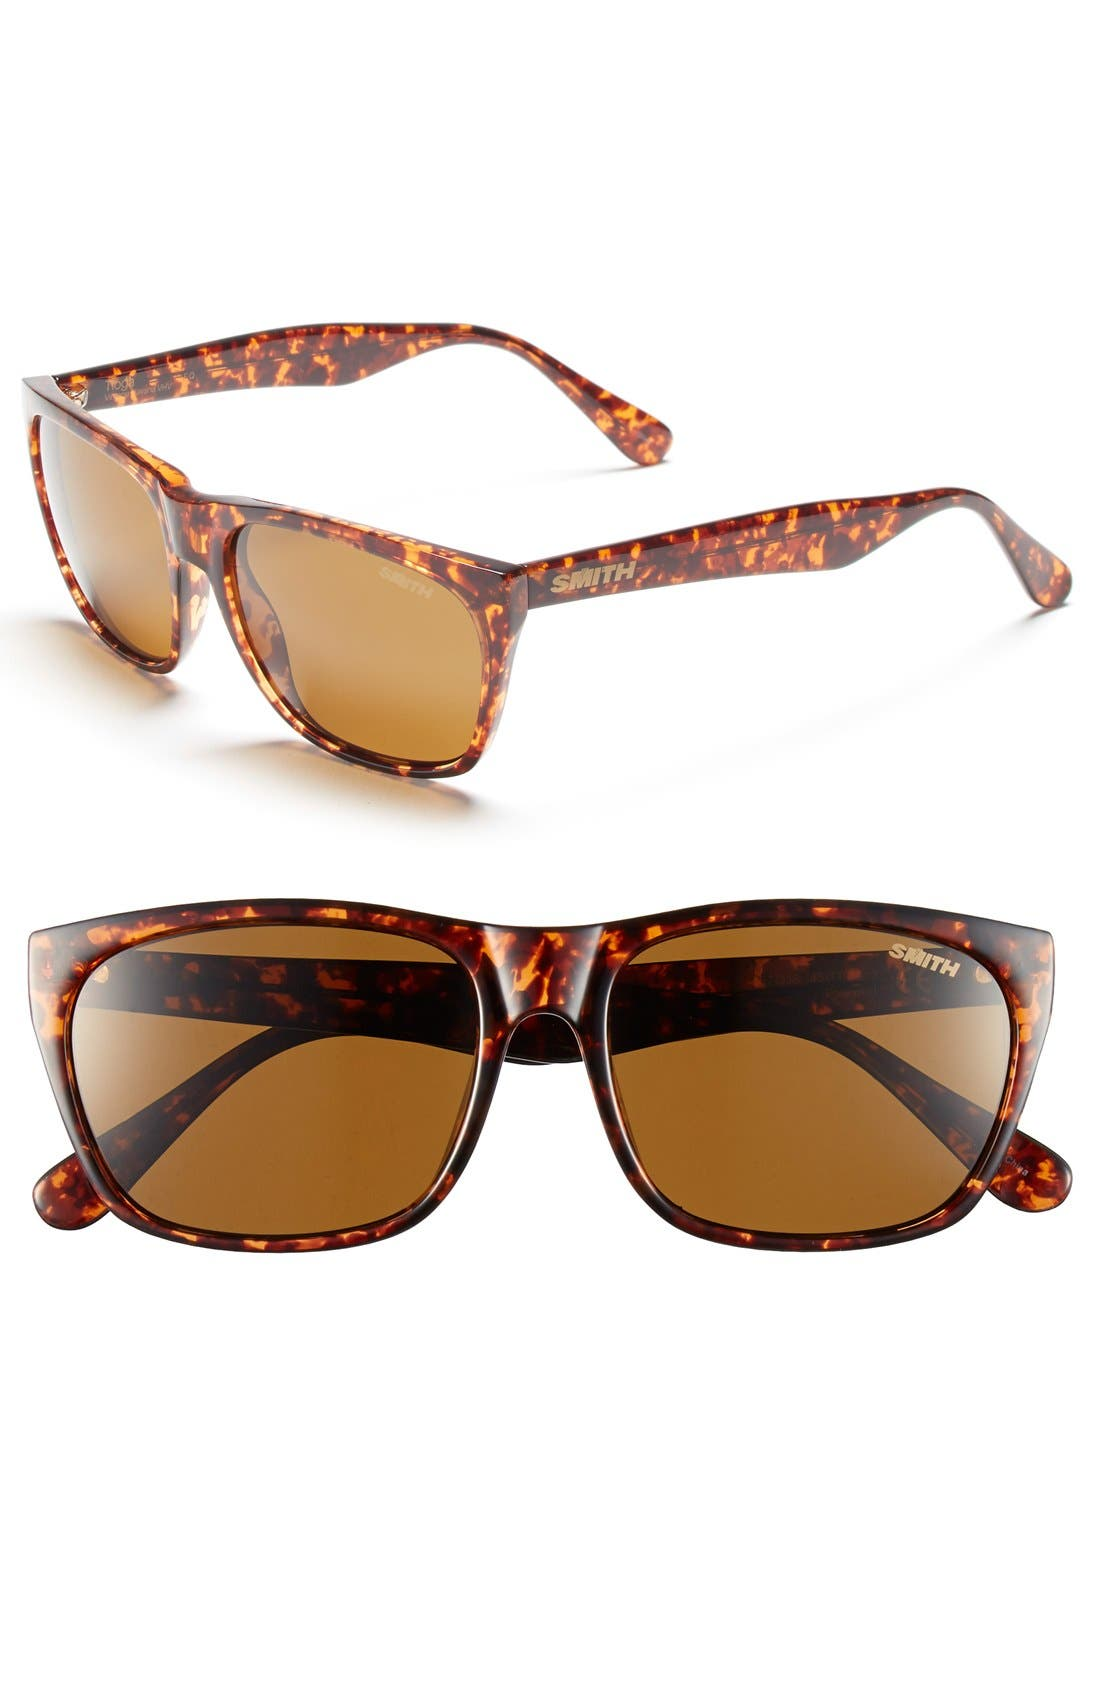 'Tioga' 57mm Polarized Sunglasses,                             Main thumbnail 1, color,                             Vintage Havana/ Polar Brown